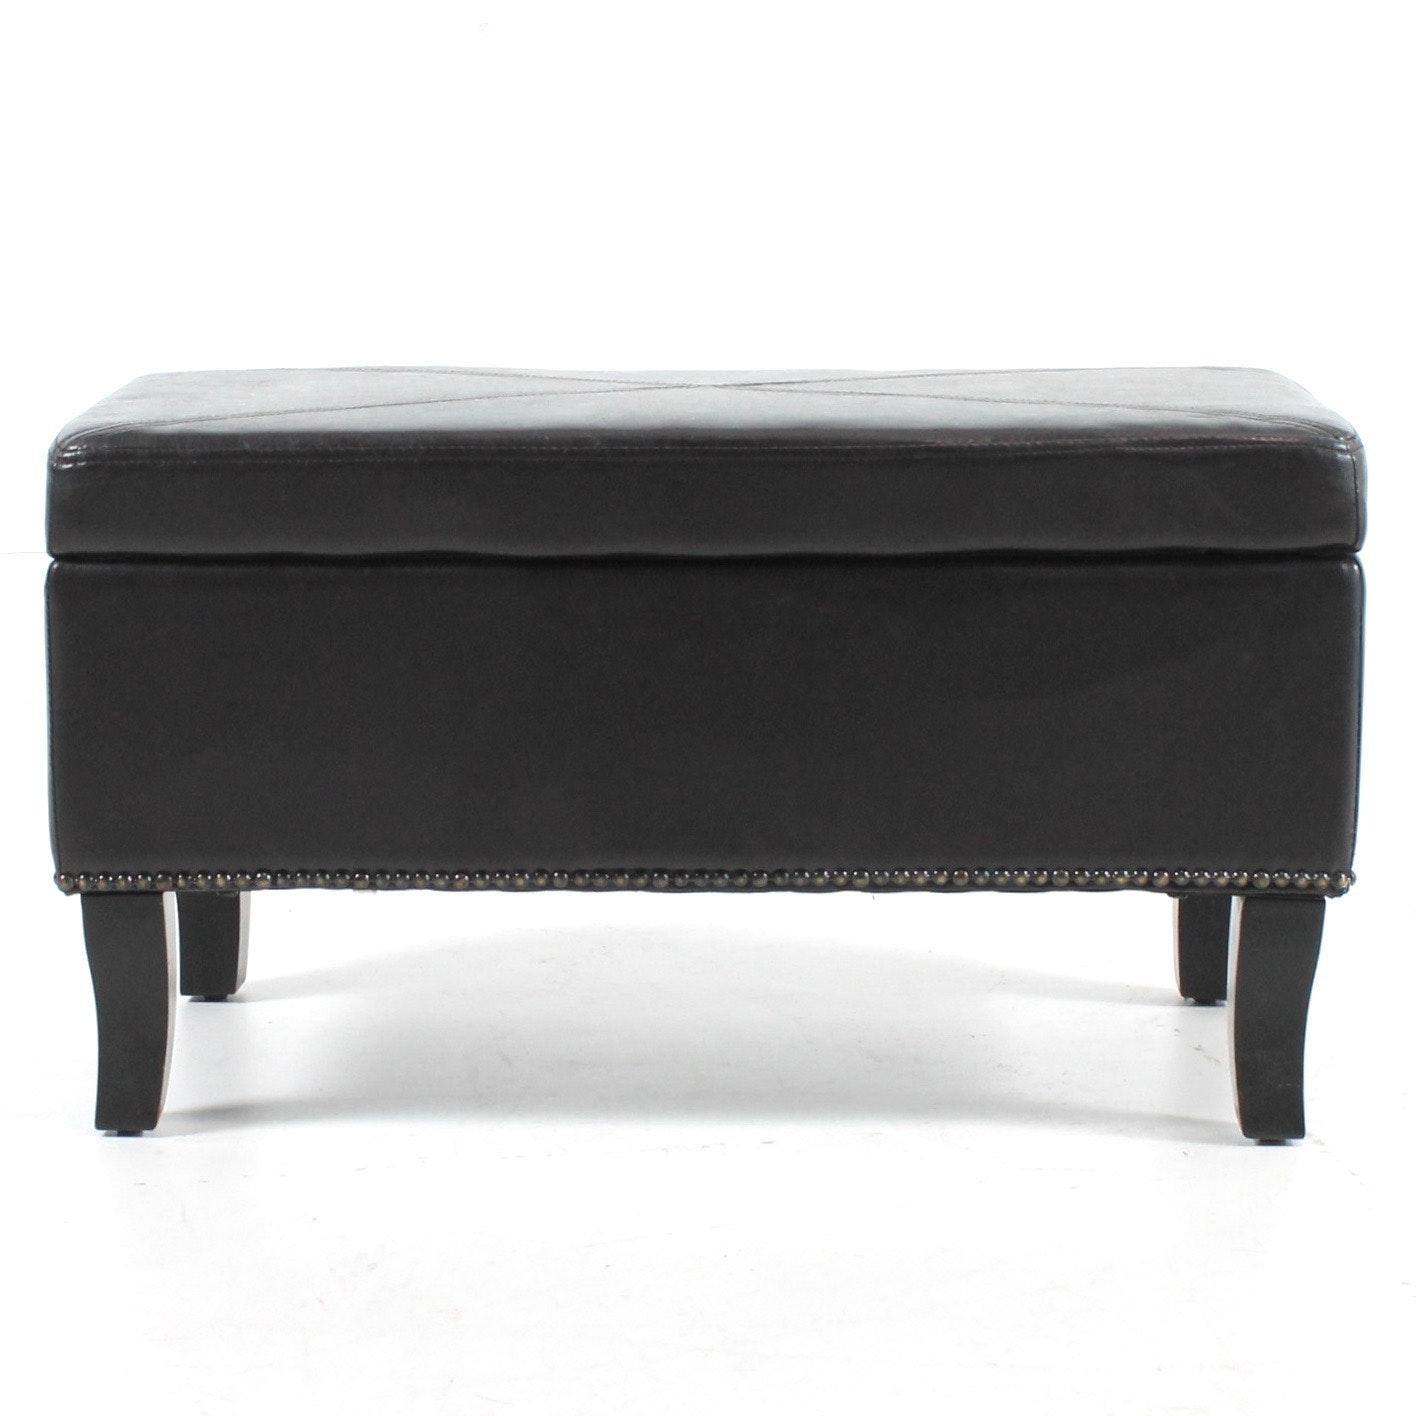 Ross Joseph Design Leather Storage Ottoman